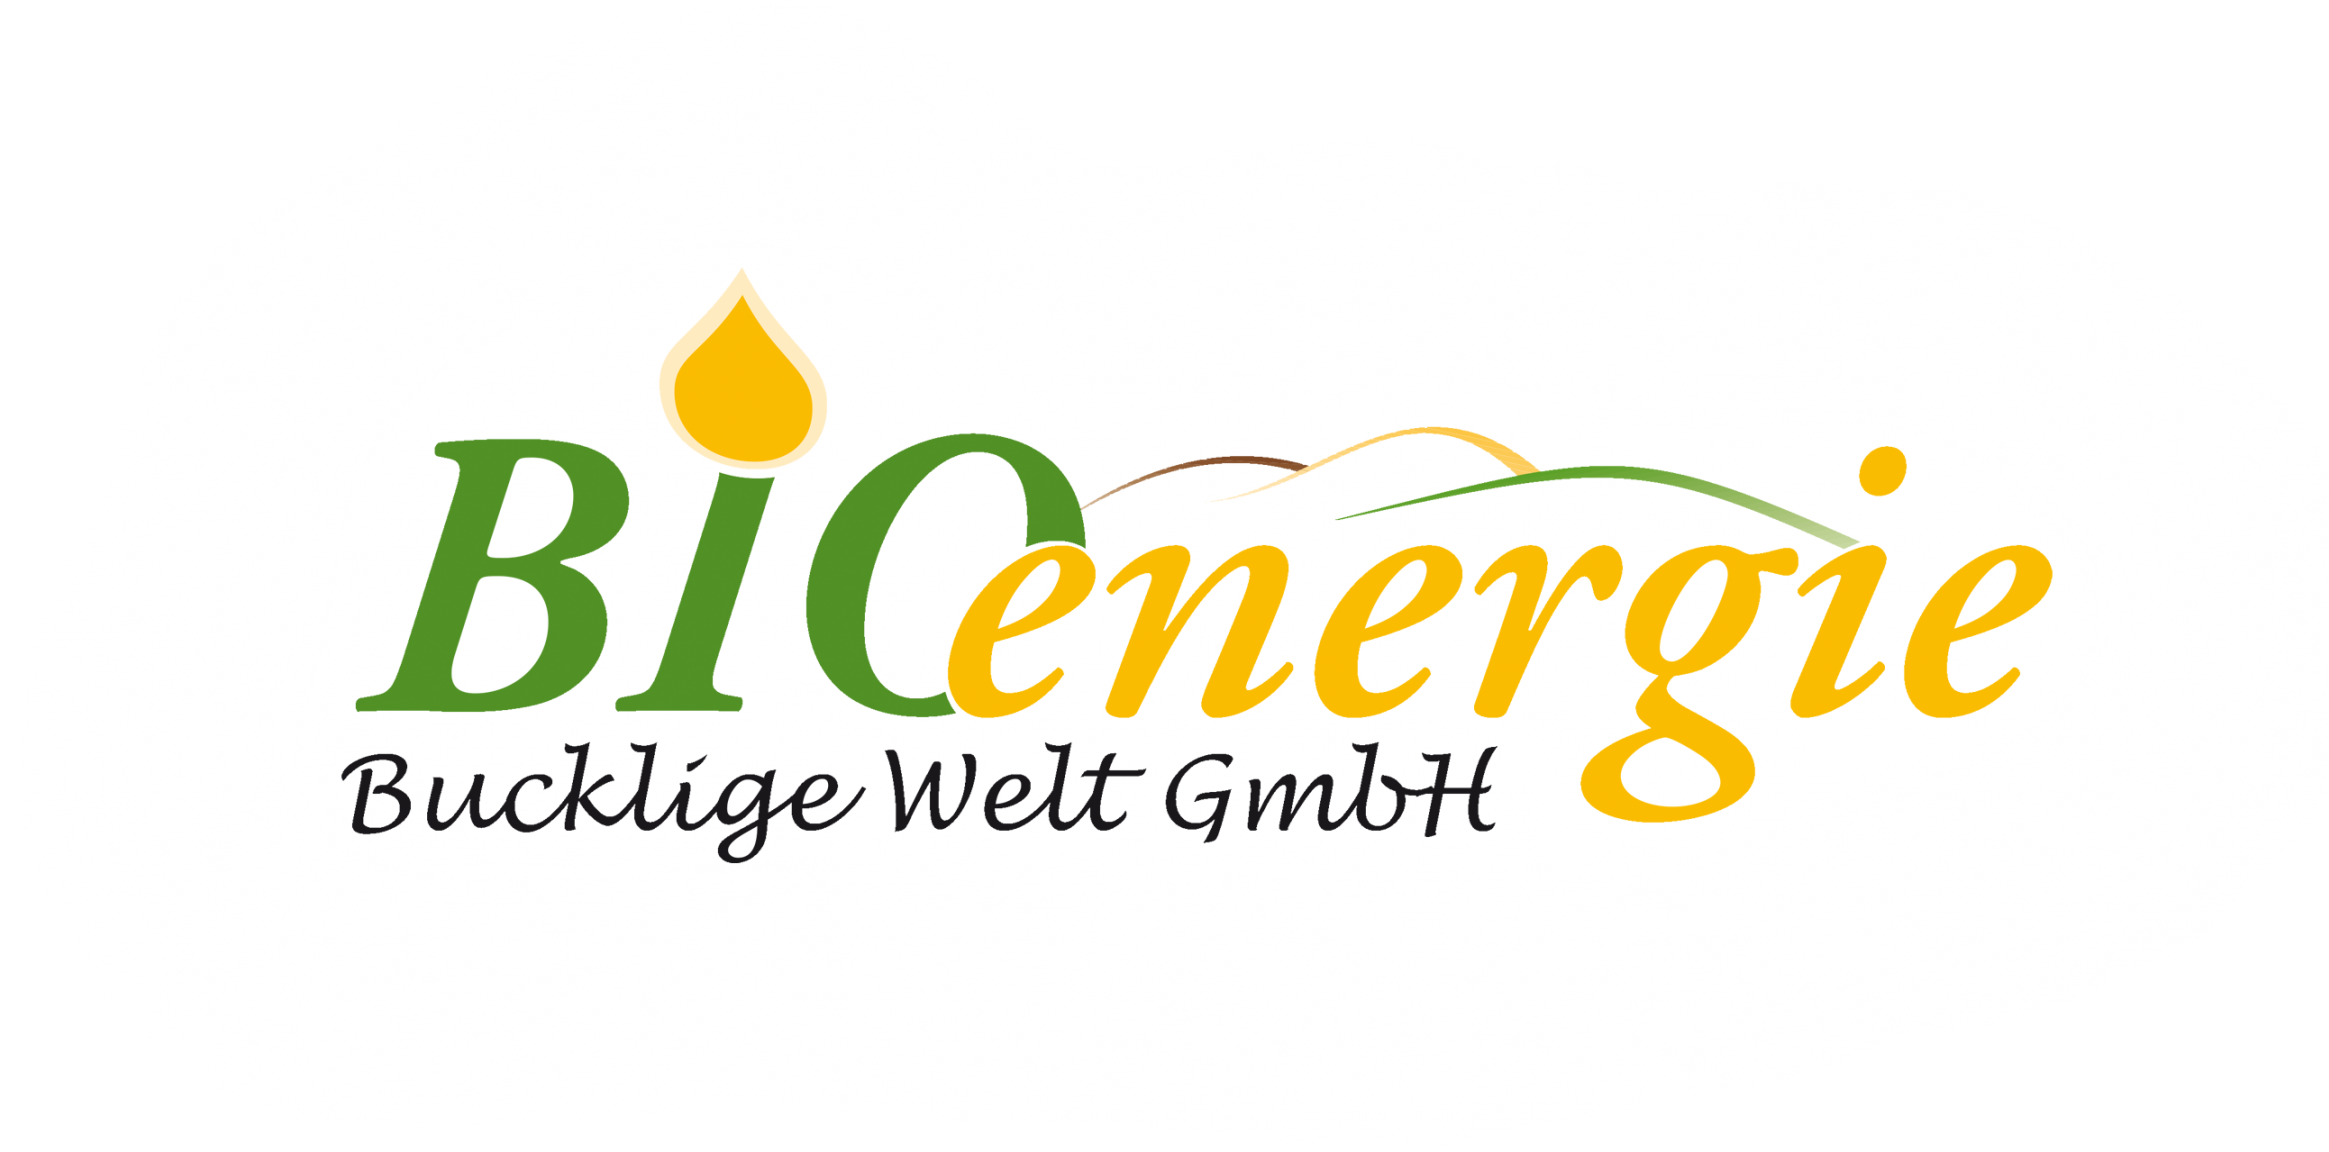 Bioenergie Bucklige Welt GmbH